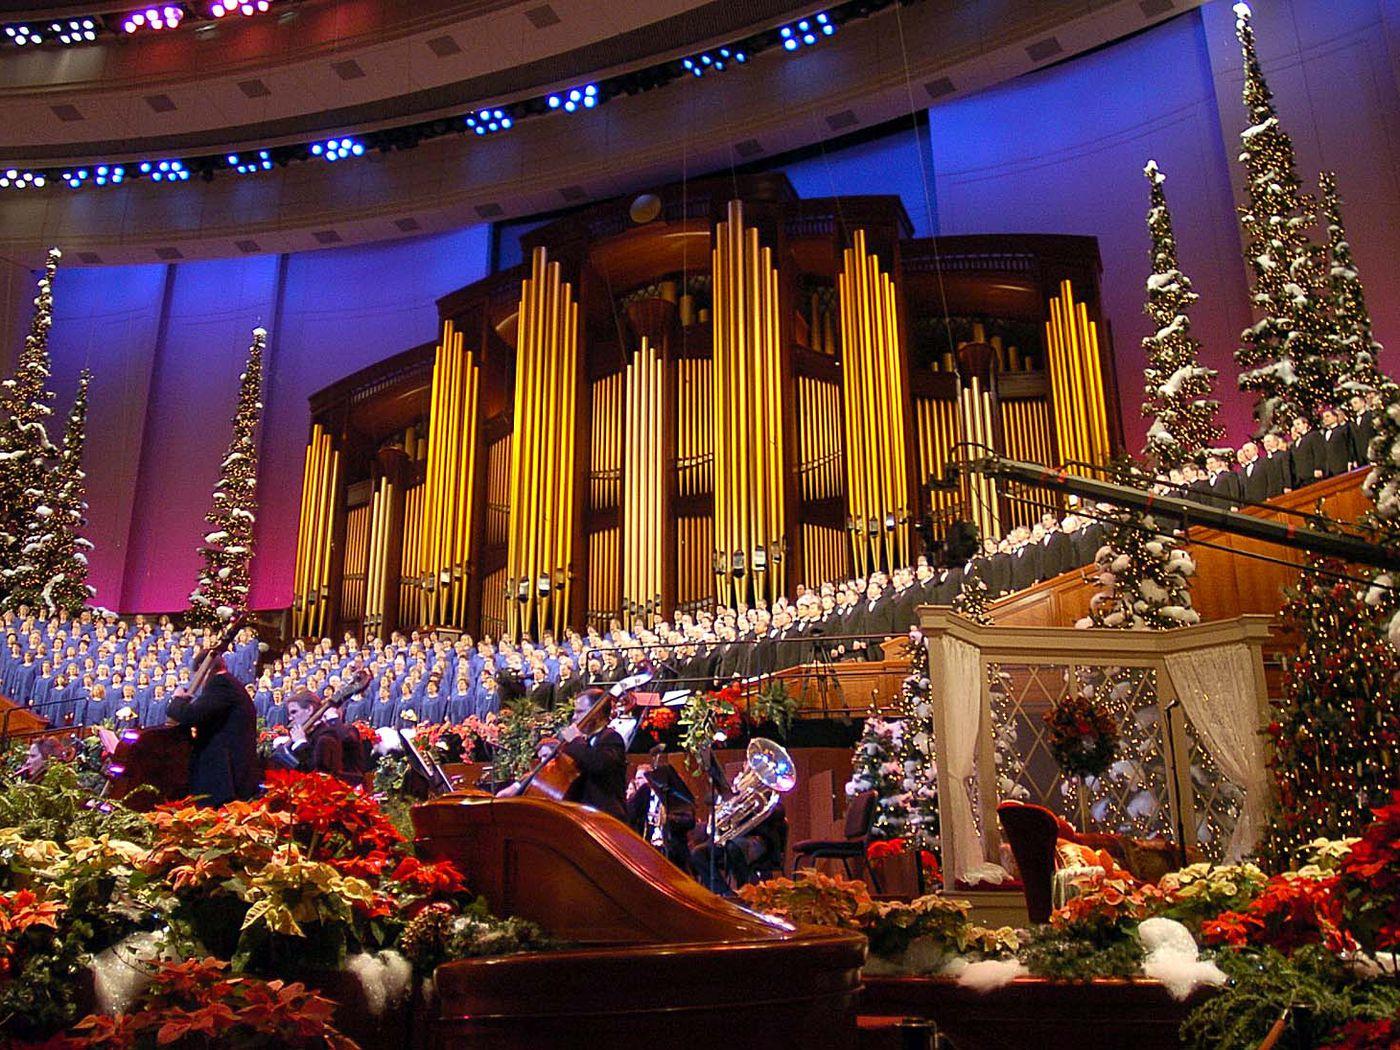 Christmas Show For Mormon Tabernacle Choir 2020 Tabernacle Choir Christmas concert, other 2020 performances